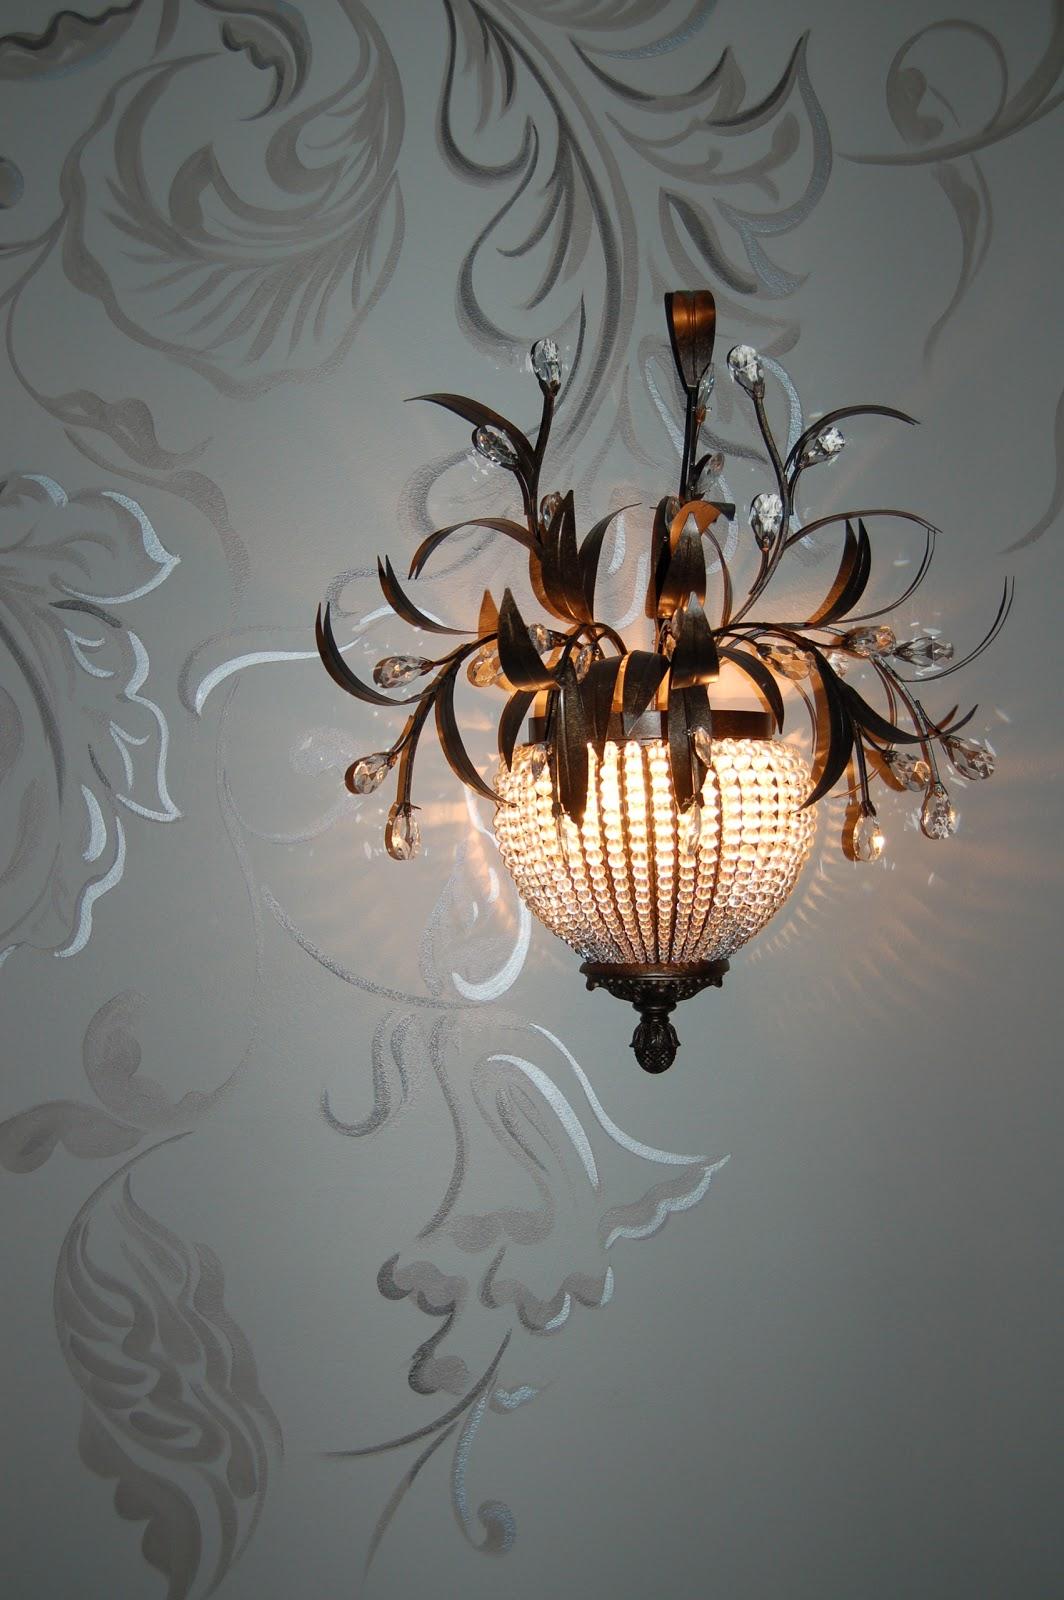 Hockman Interior Design: Impact of Lighting